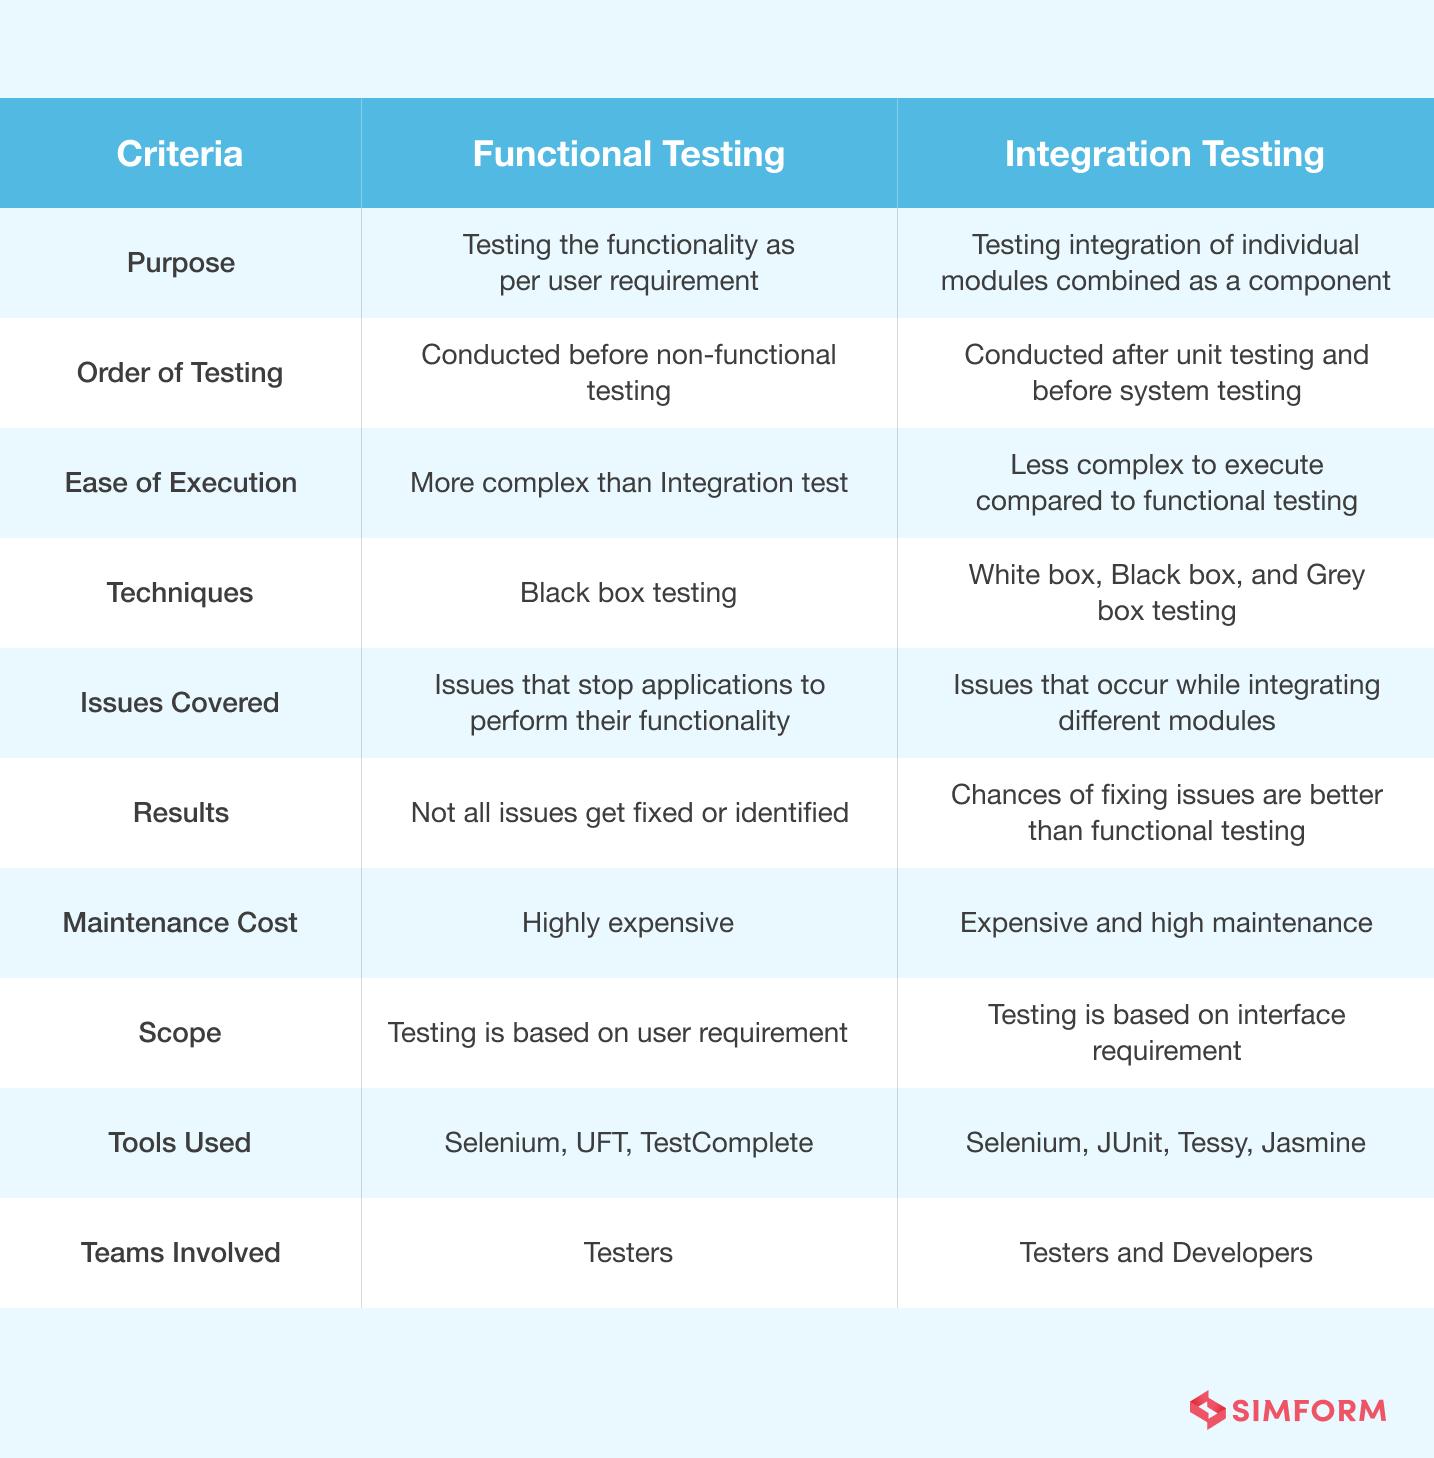 functional vs integration testing comparison chart